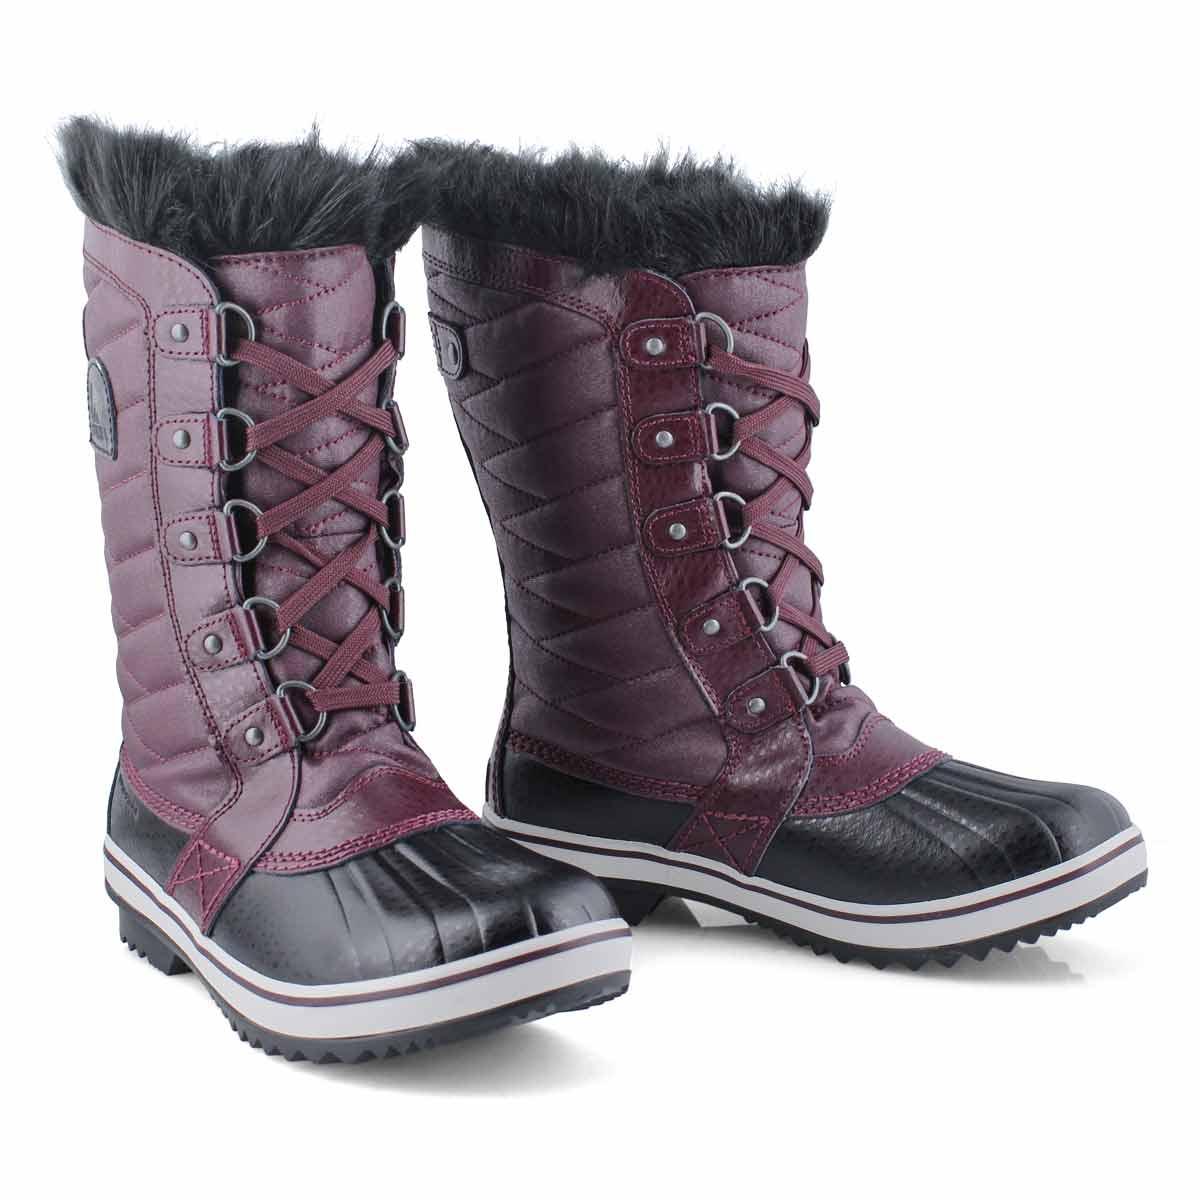 Grls Tofino II plum wtpf winter boot